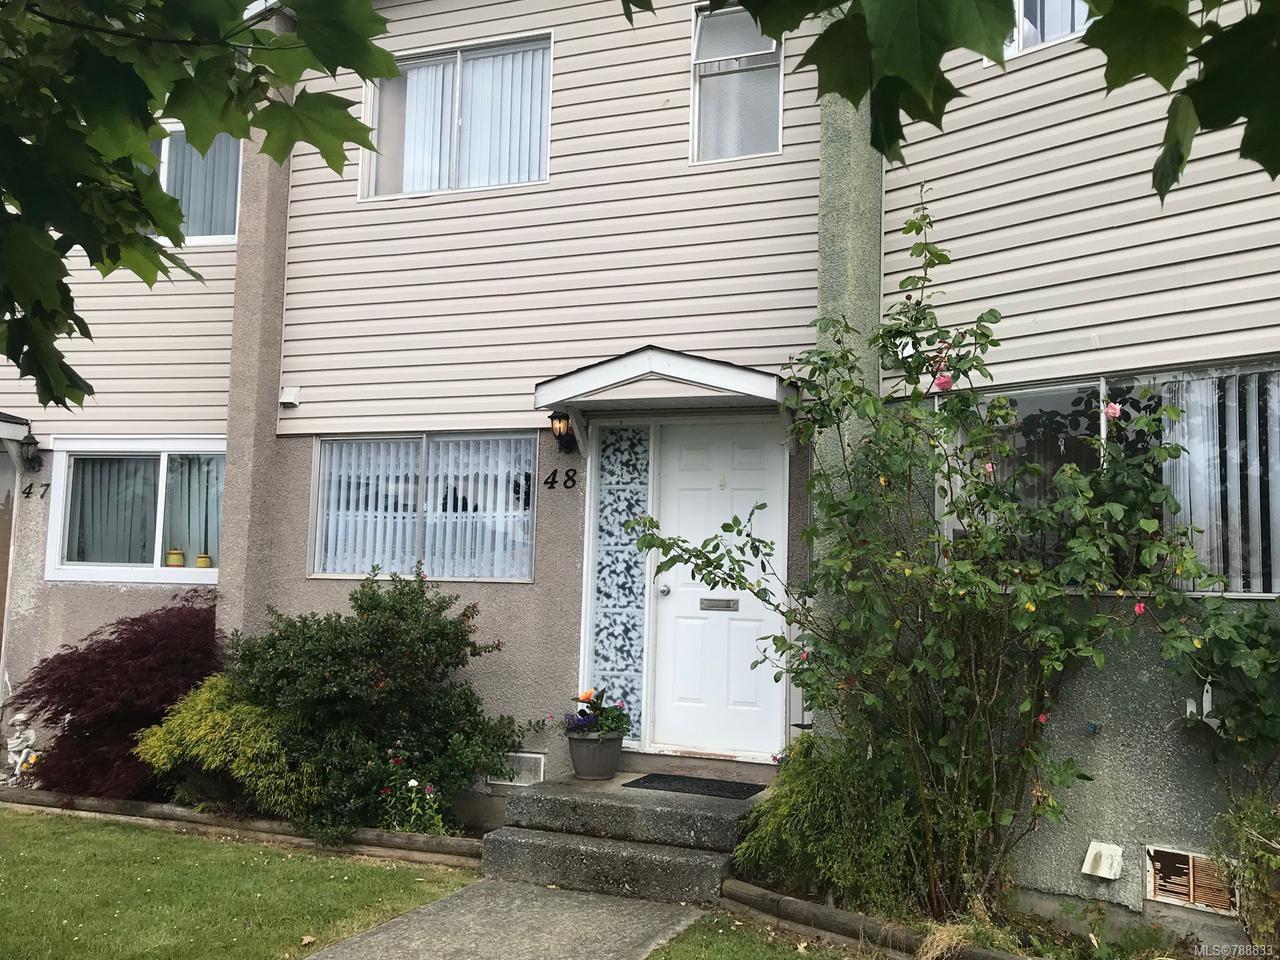 Main Photo: 48 4110 Kendall Ave in PORT ALBERNI: PA Port Alberni Row/Townhouse for sale (Port Alberni)  : MLS®# 788833